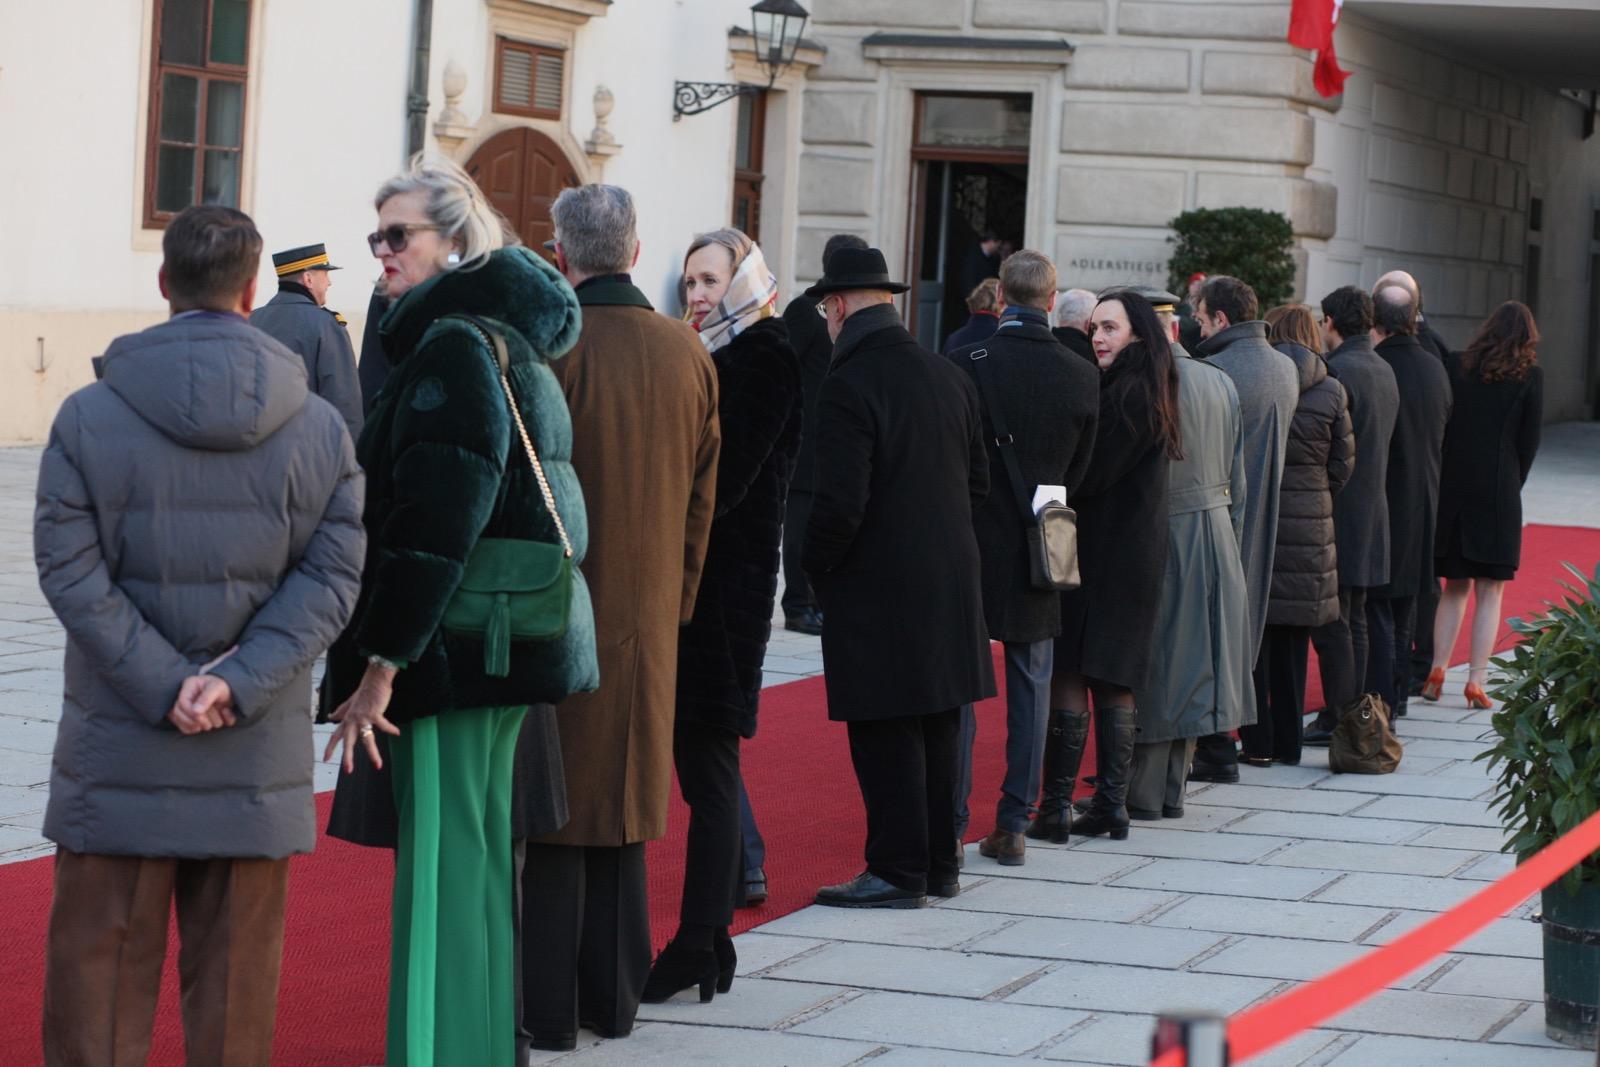 2019_01_11_1Gardekompanie_HBP_SUI_Präsident_Schweiz_Burghof - 34 of 36